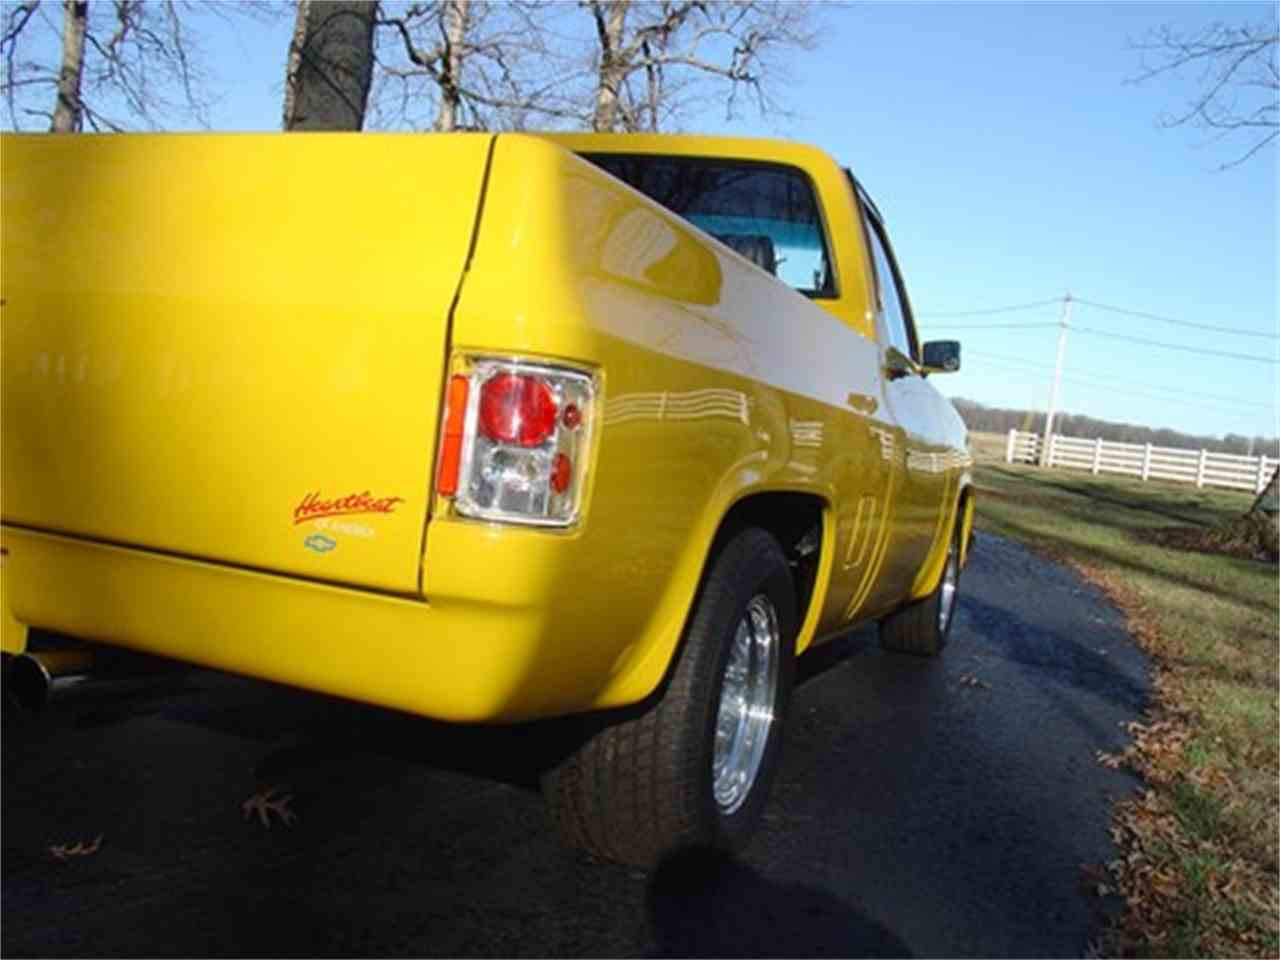 Large Picture of 1981 Chevrolet C/K 1500 located in Scipio Indiana - $21,500.00 - M3LS